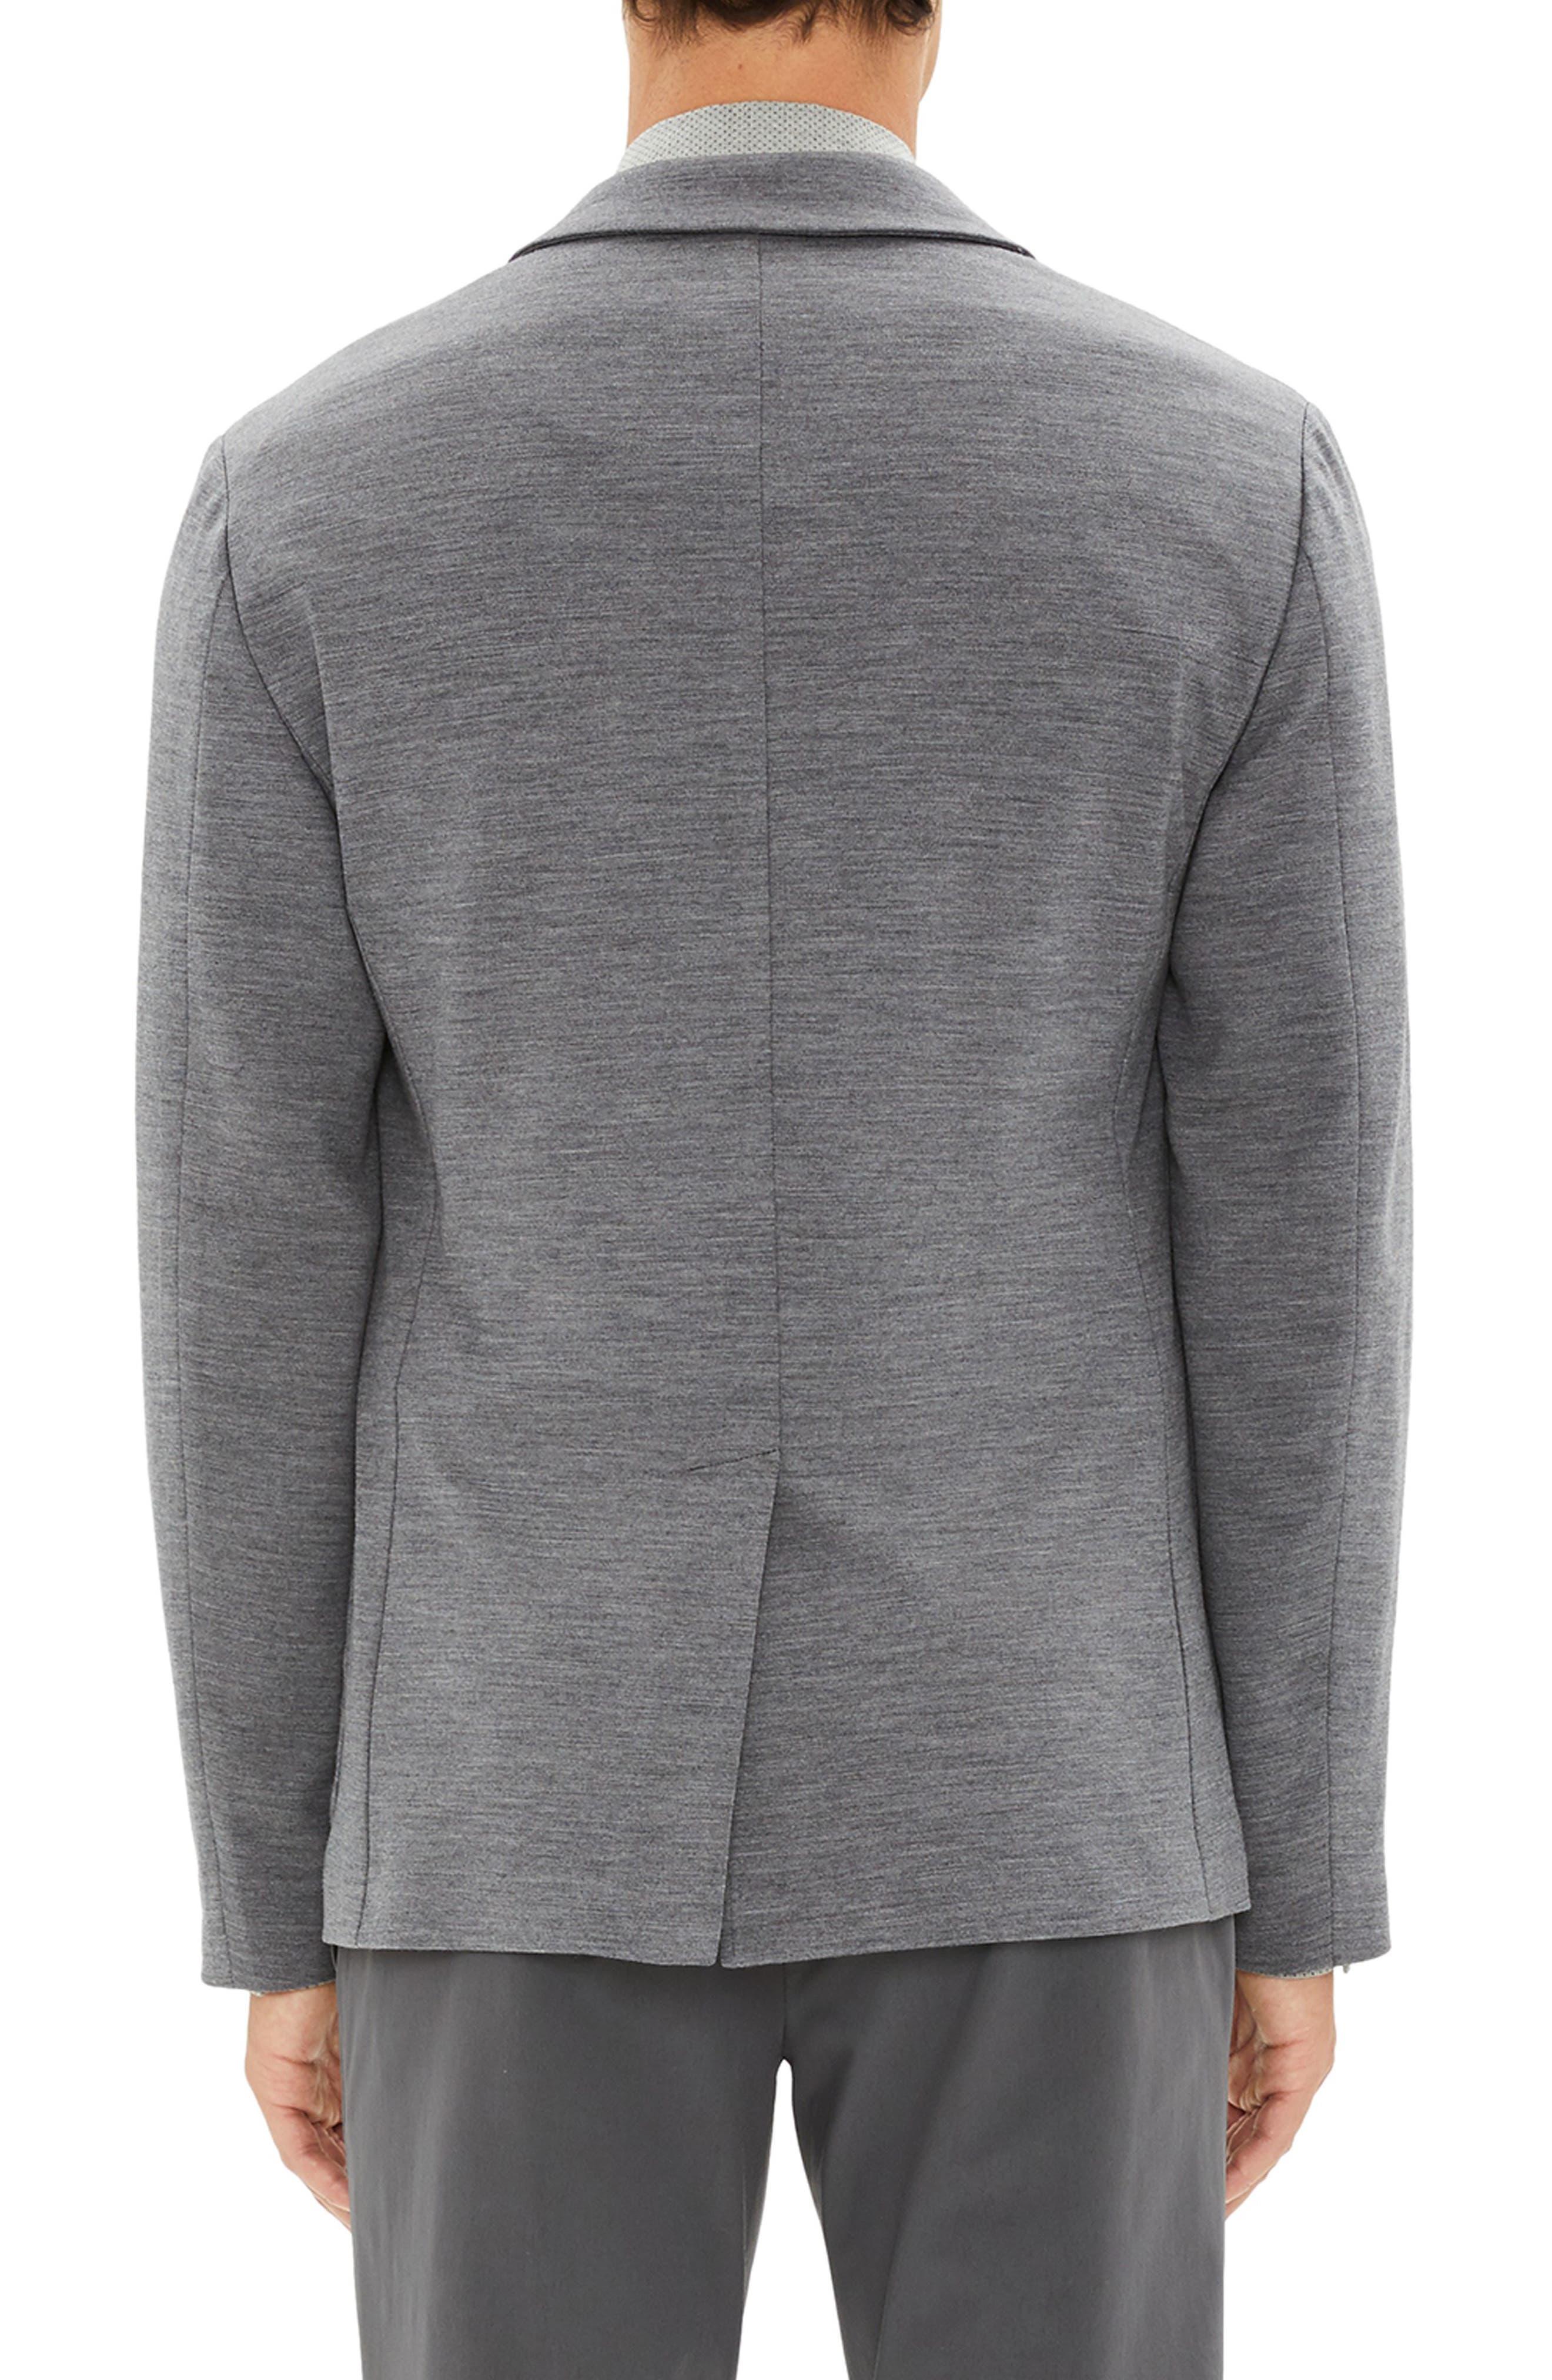 Clinton Wool Interlock Sport Coat,                             Alternate thumbnail 2, color,                             DARK GREY MELANGE